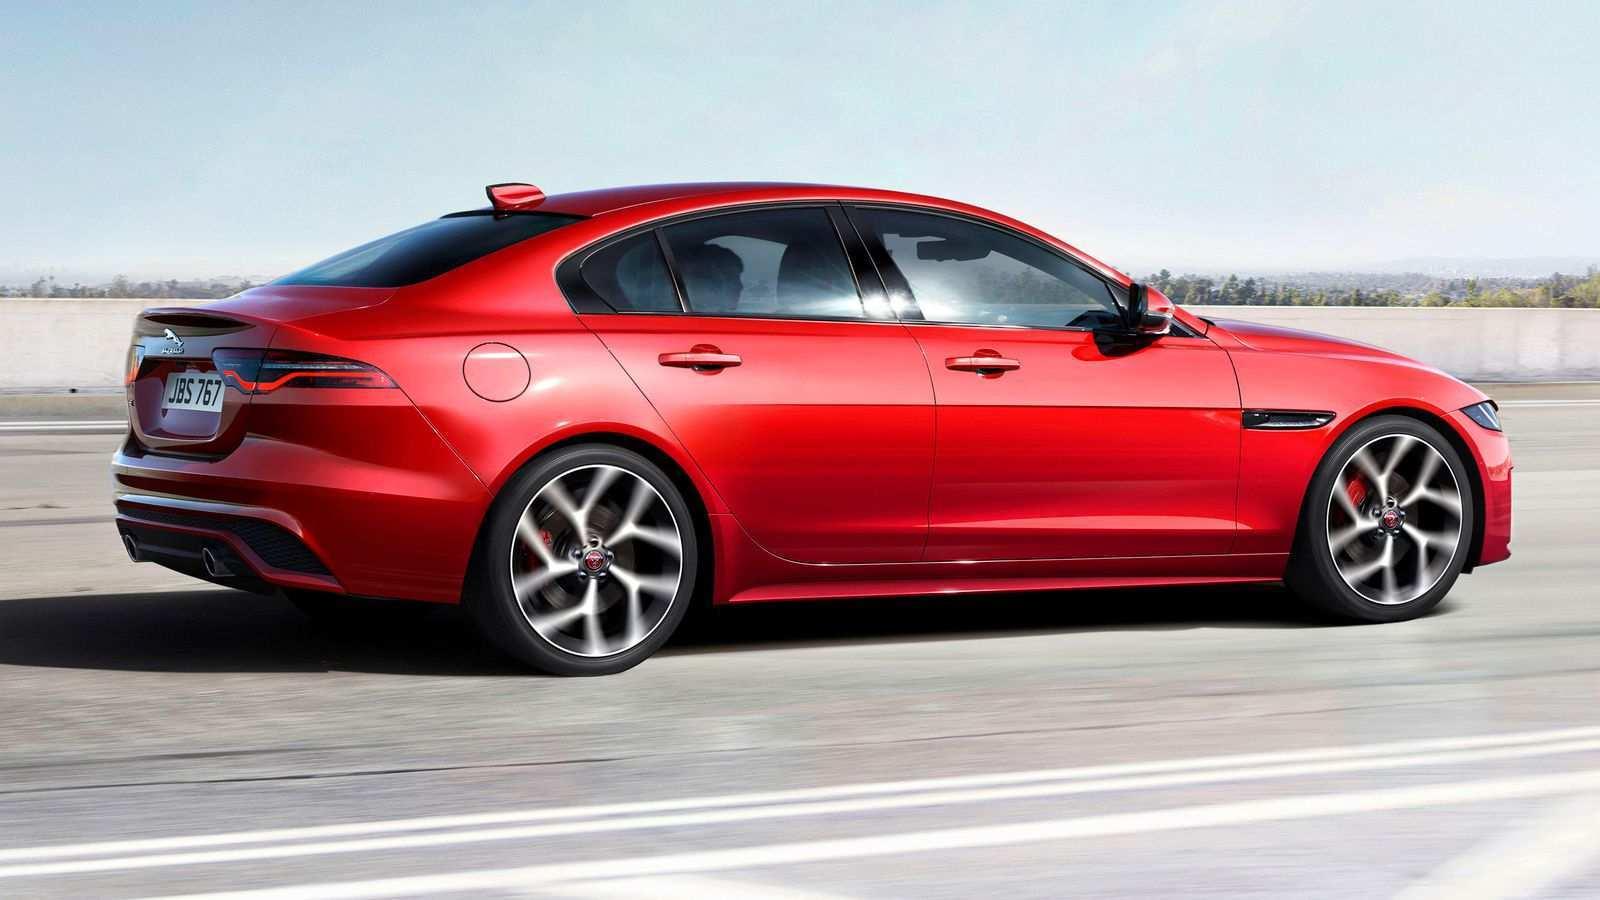 65 All New Jaguar Xe Facelift 2020 Performance with Jaguar Xe Facelift 2020